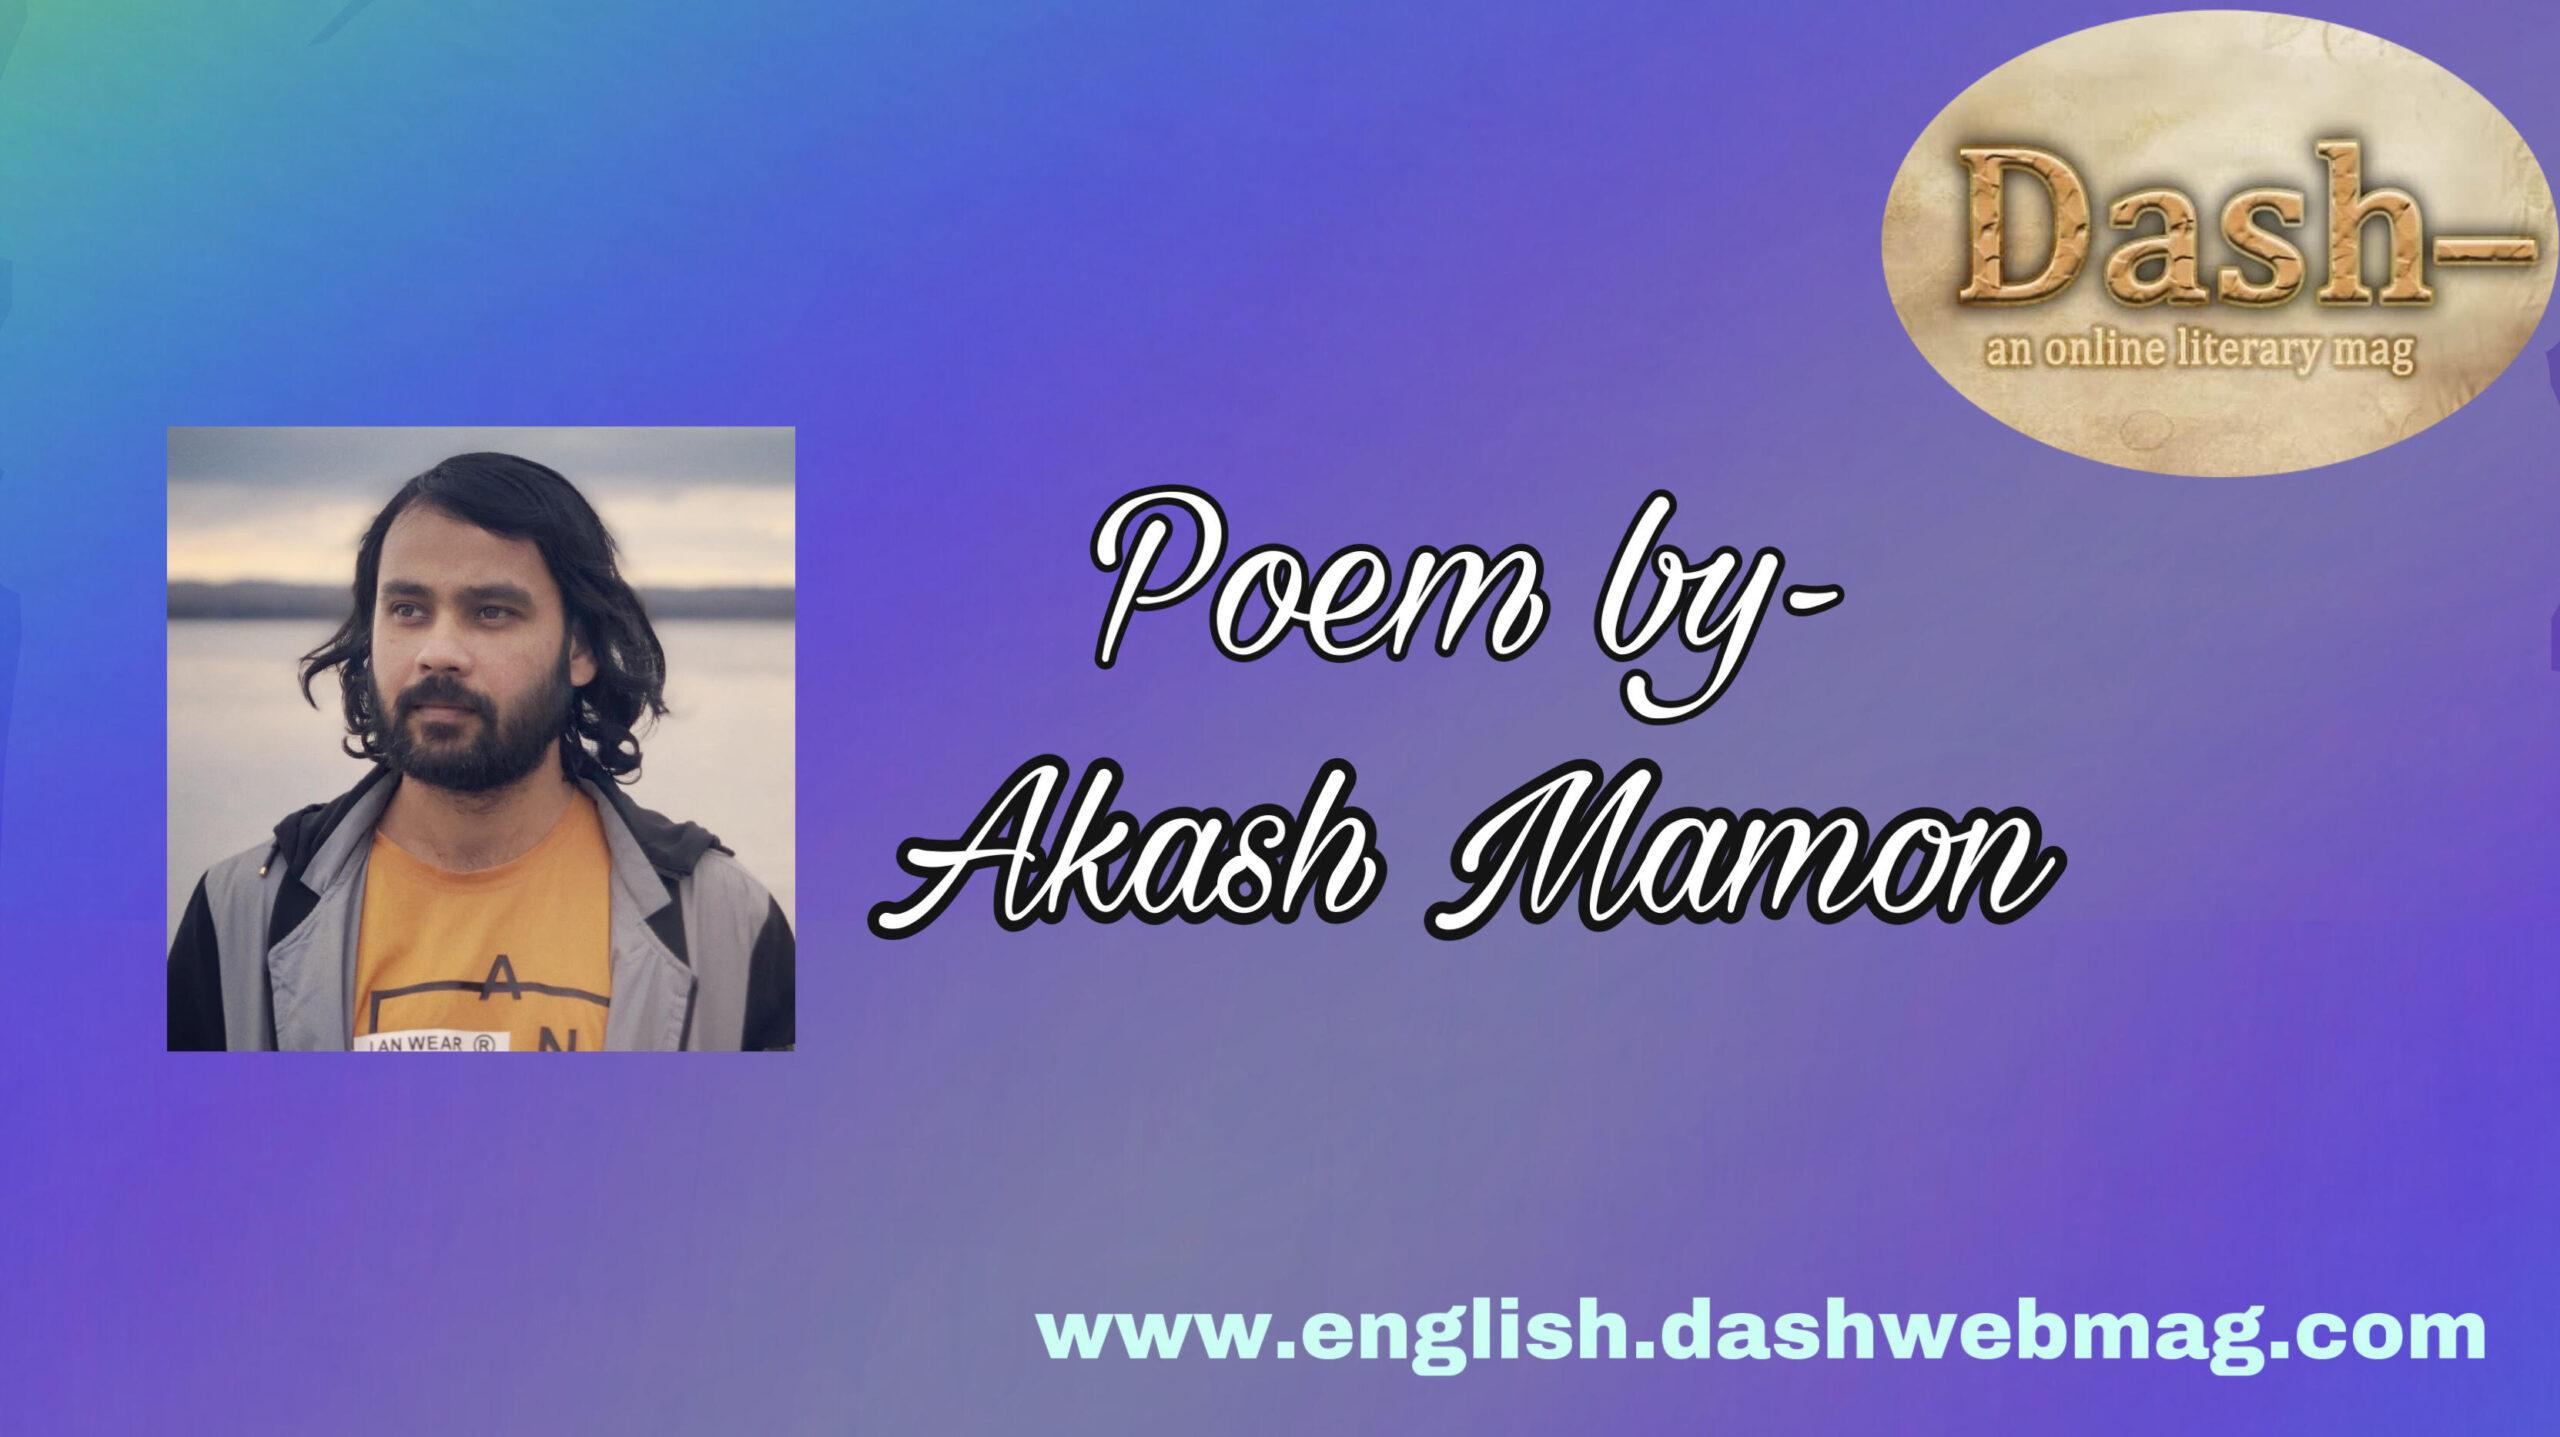 Poems by- Akash Mamon